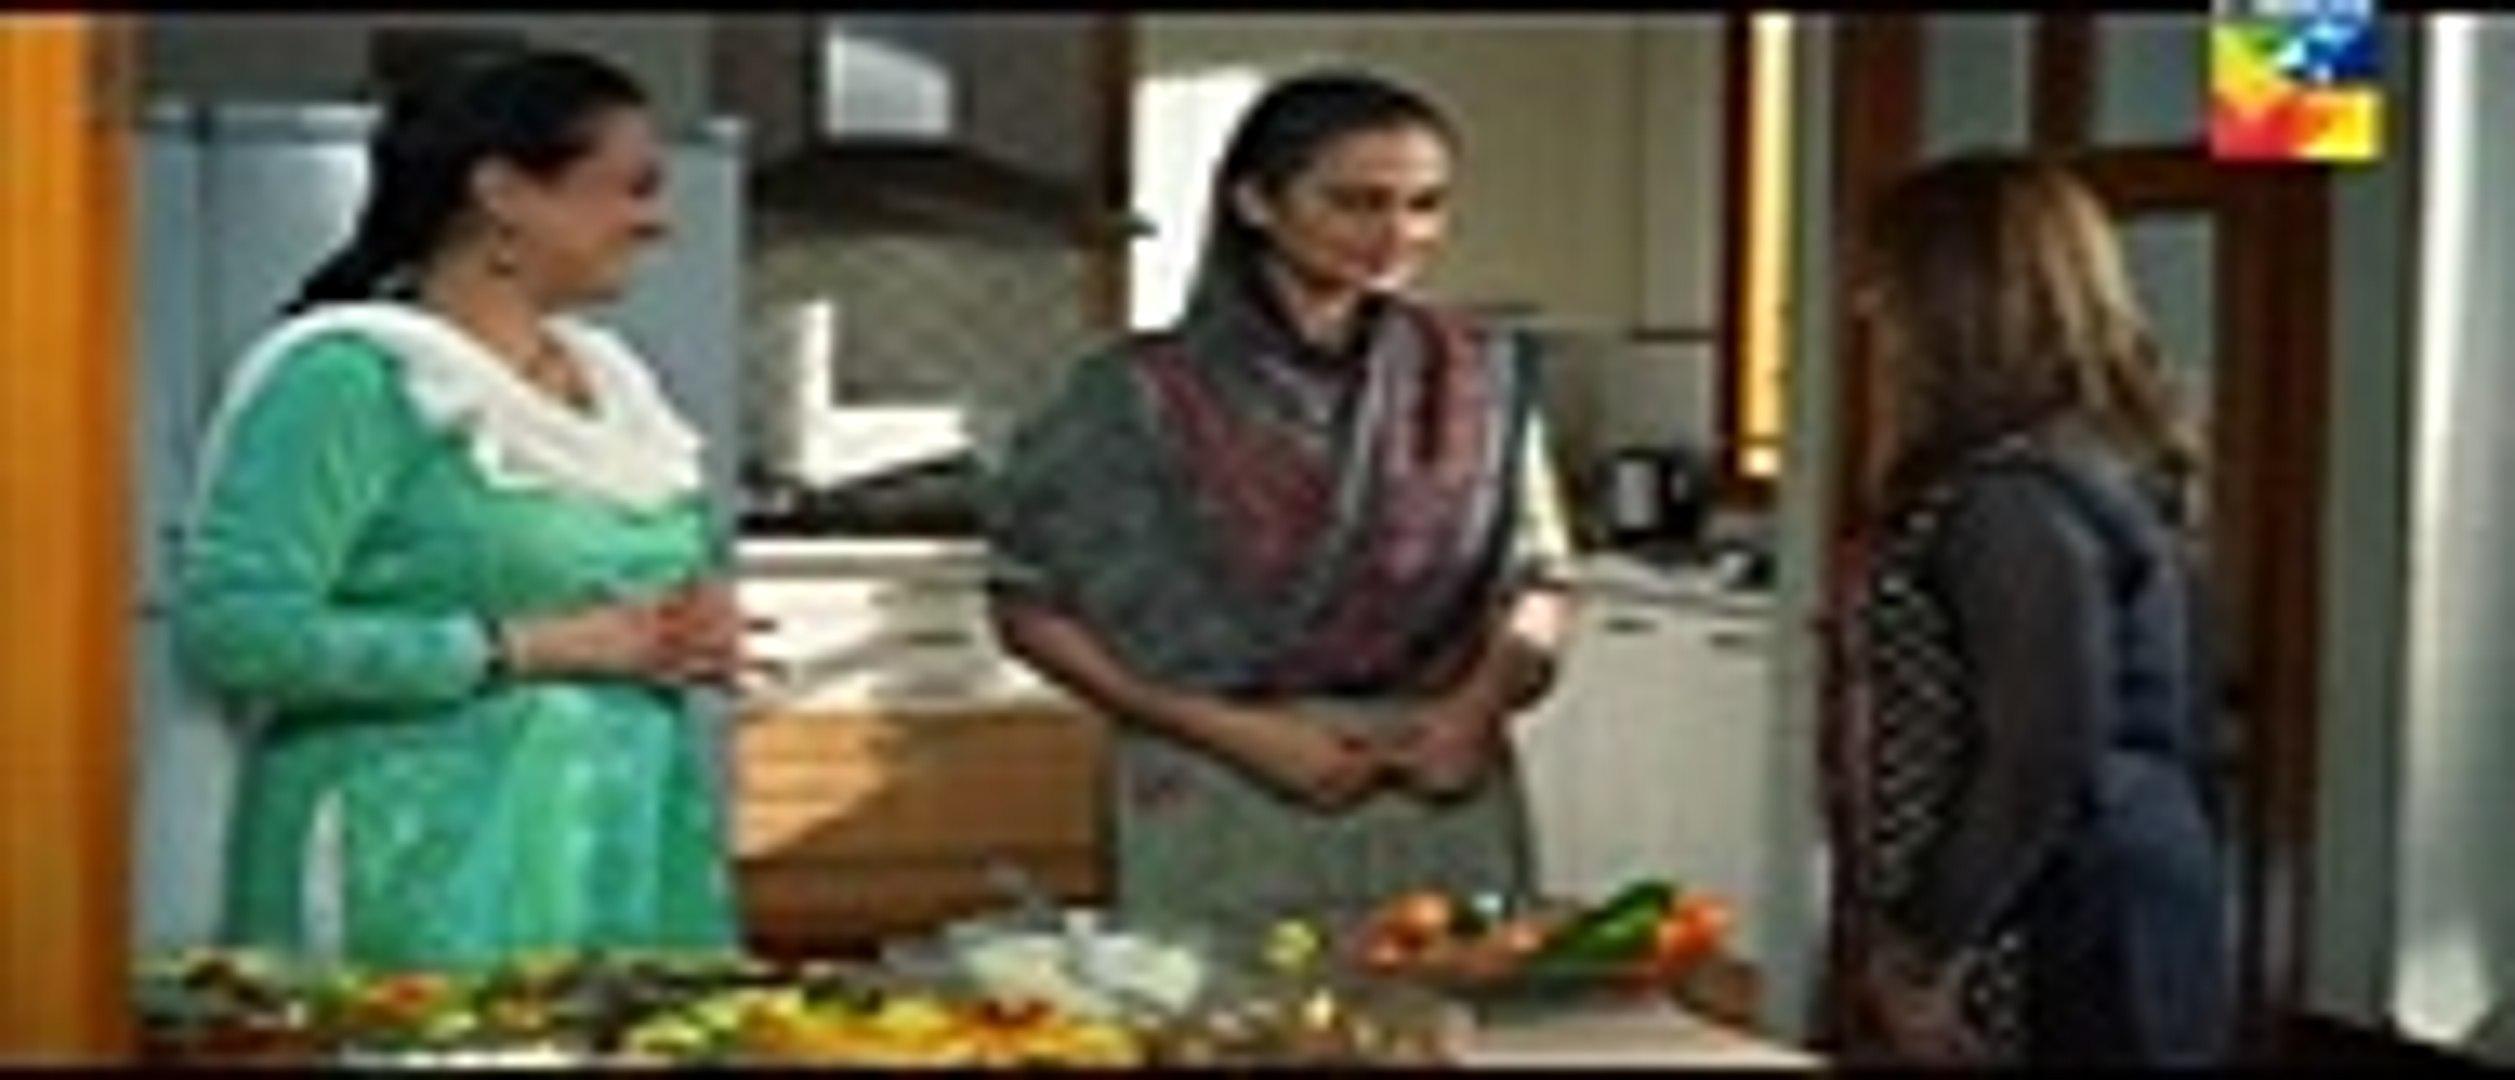 Udari Episode 15 Full 17 July 2016 On Hum Tv - Udaari by pk Entertainment HD , Tv series online free